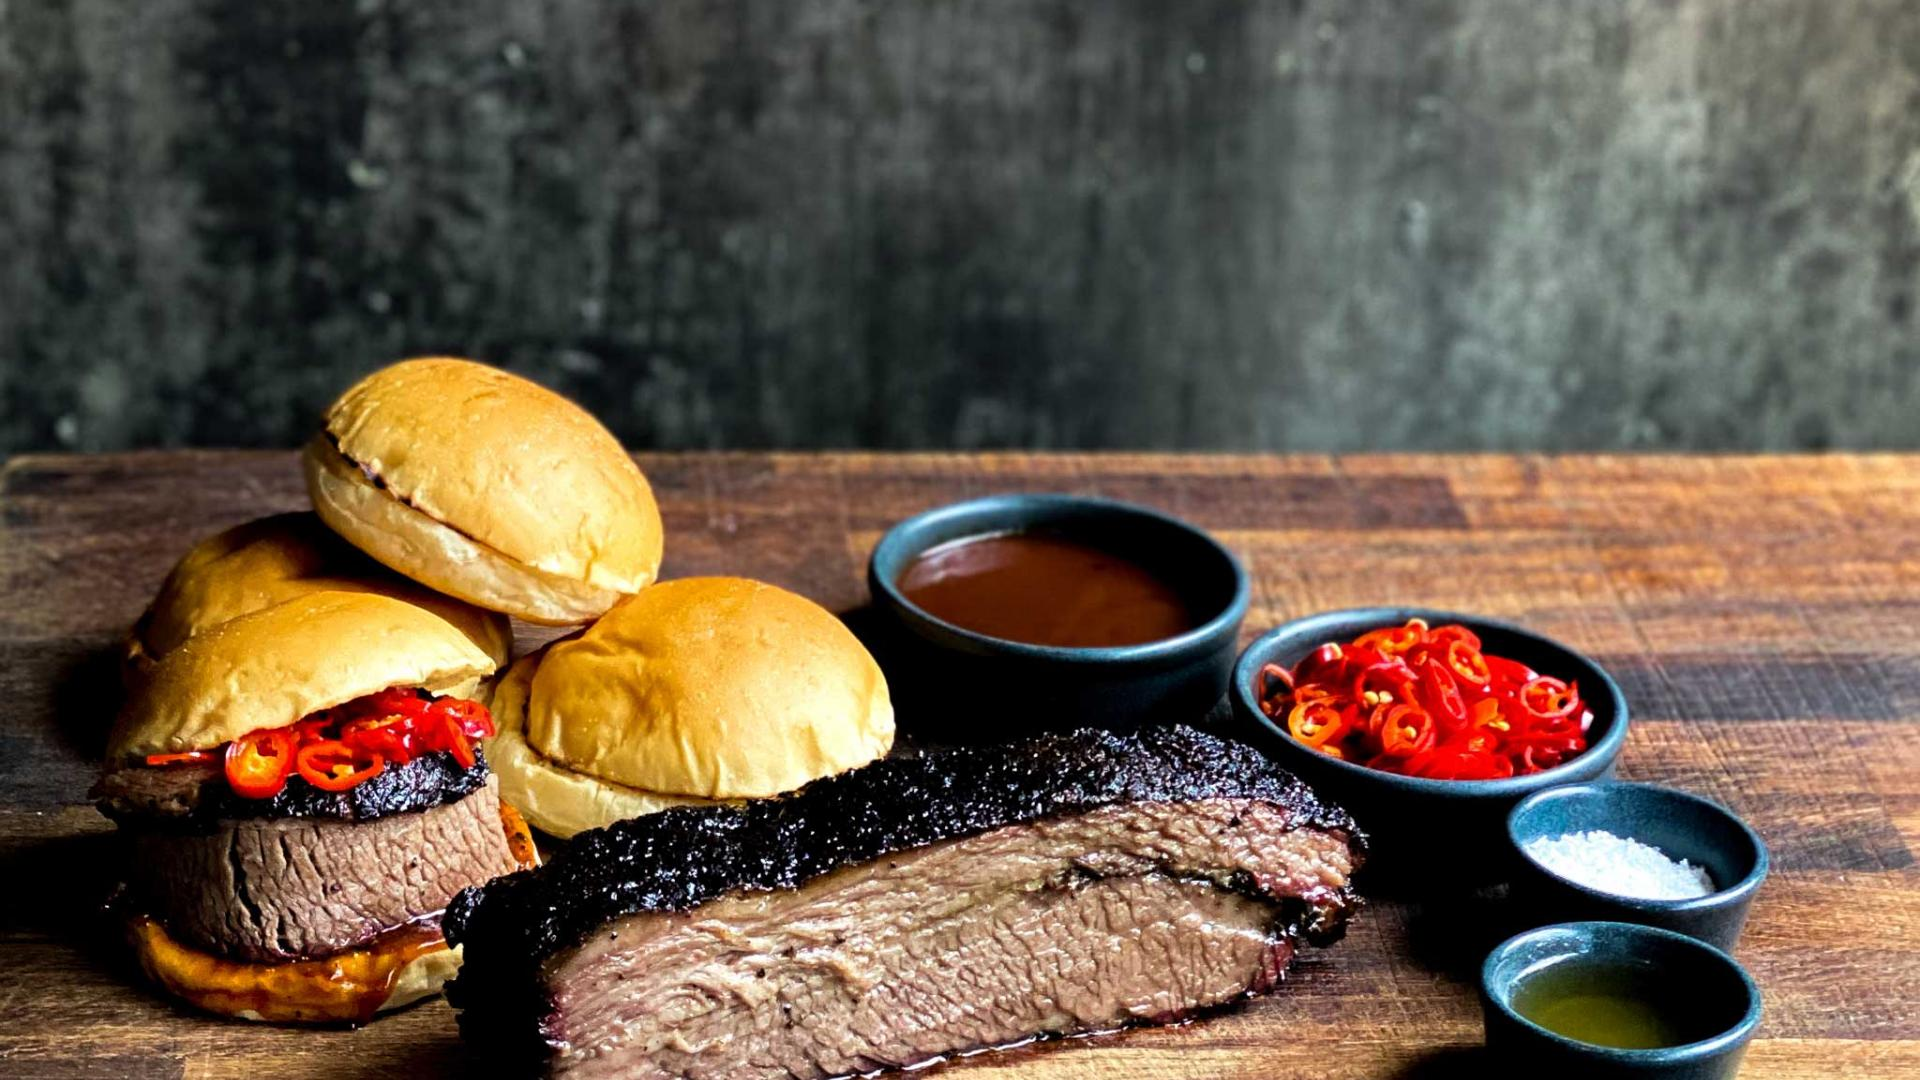 Restaurant meal kits: Smokestak